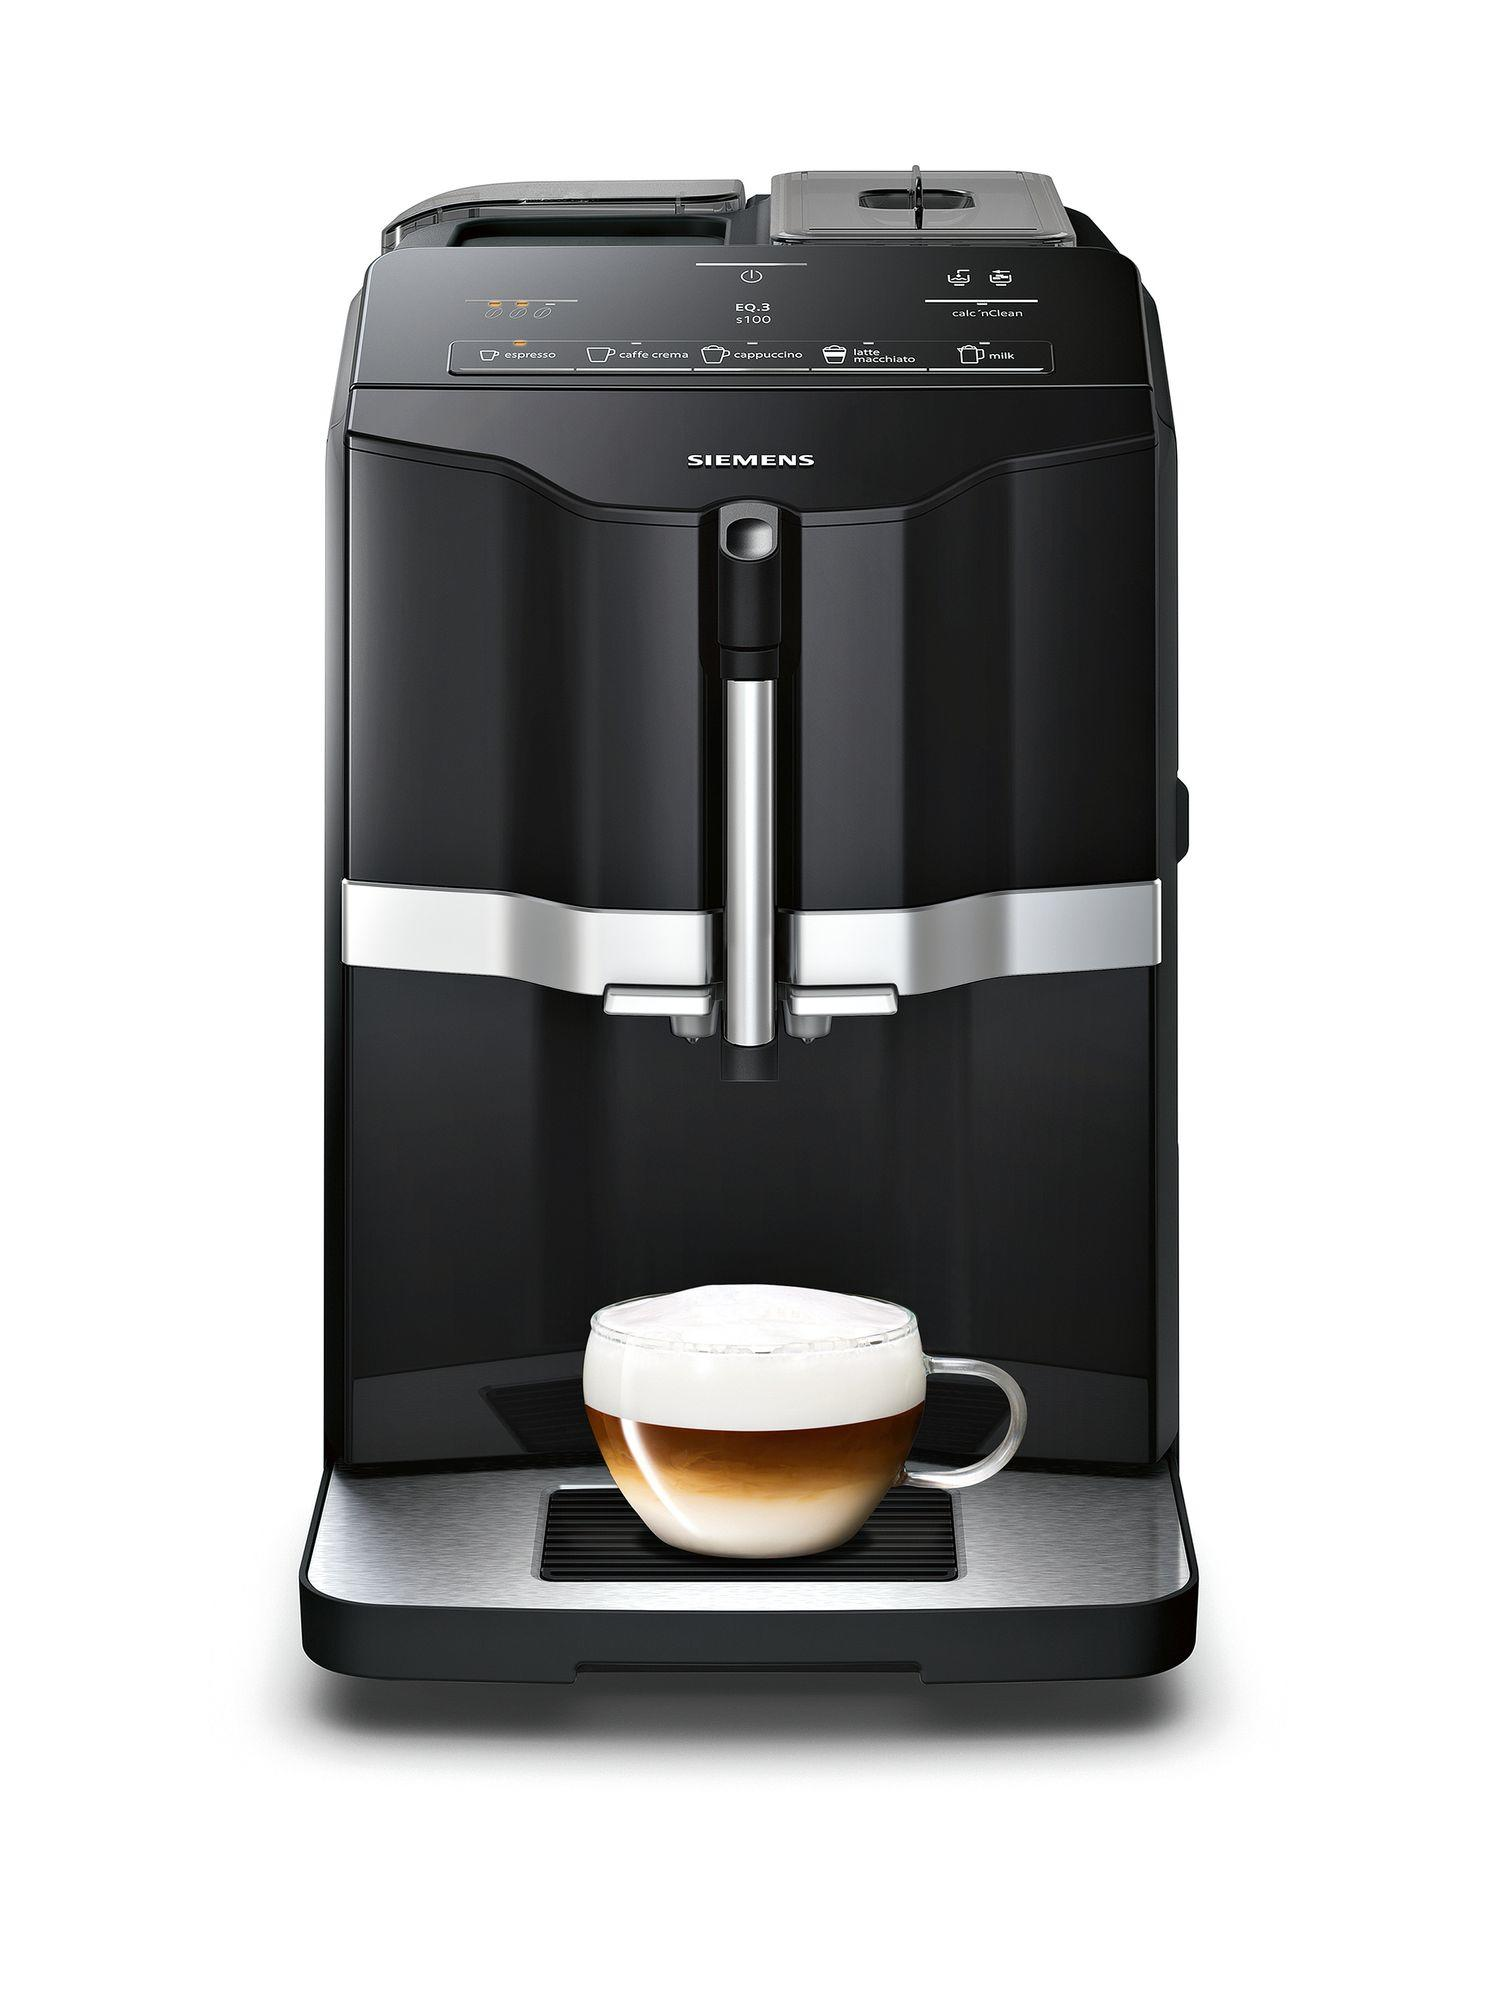 Image of TI301209RW EQ.3 s100 Fully Automatic Coffee Machine